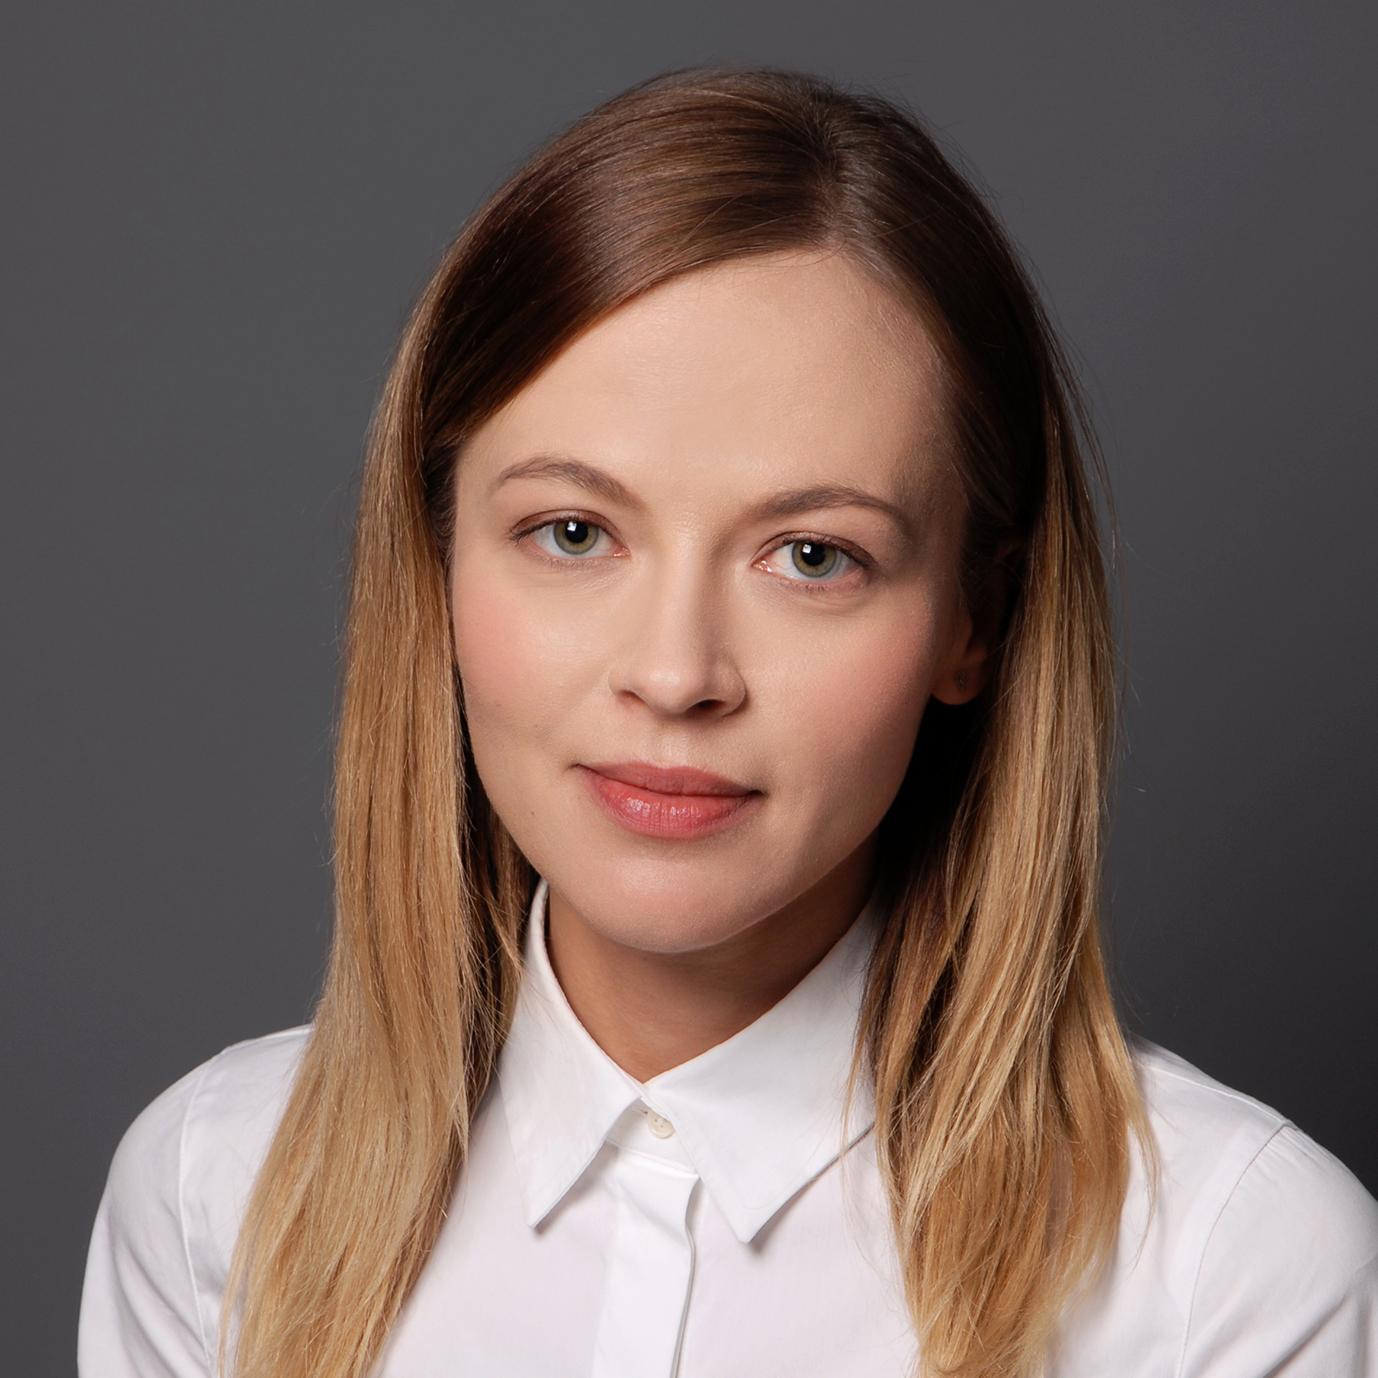 Natalia Lamprycht-Janek